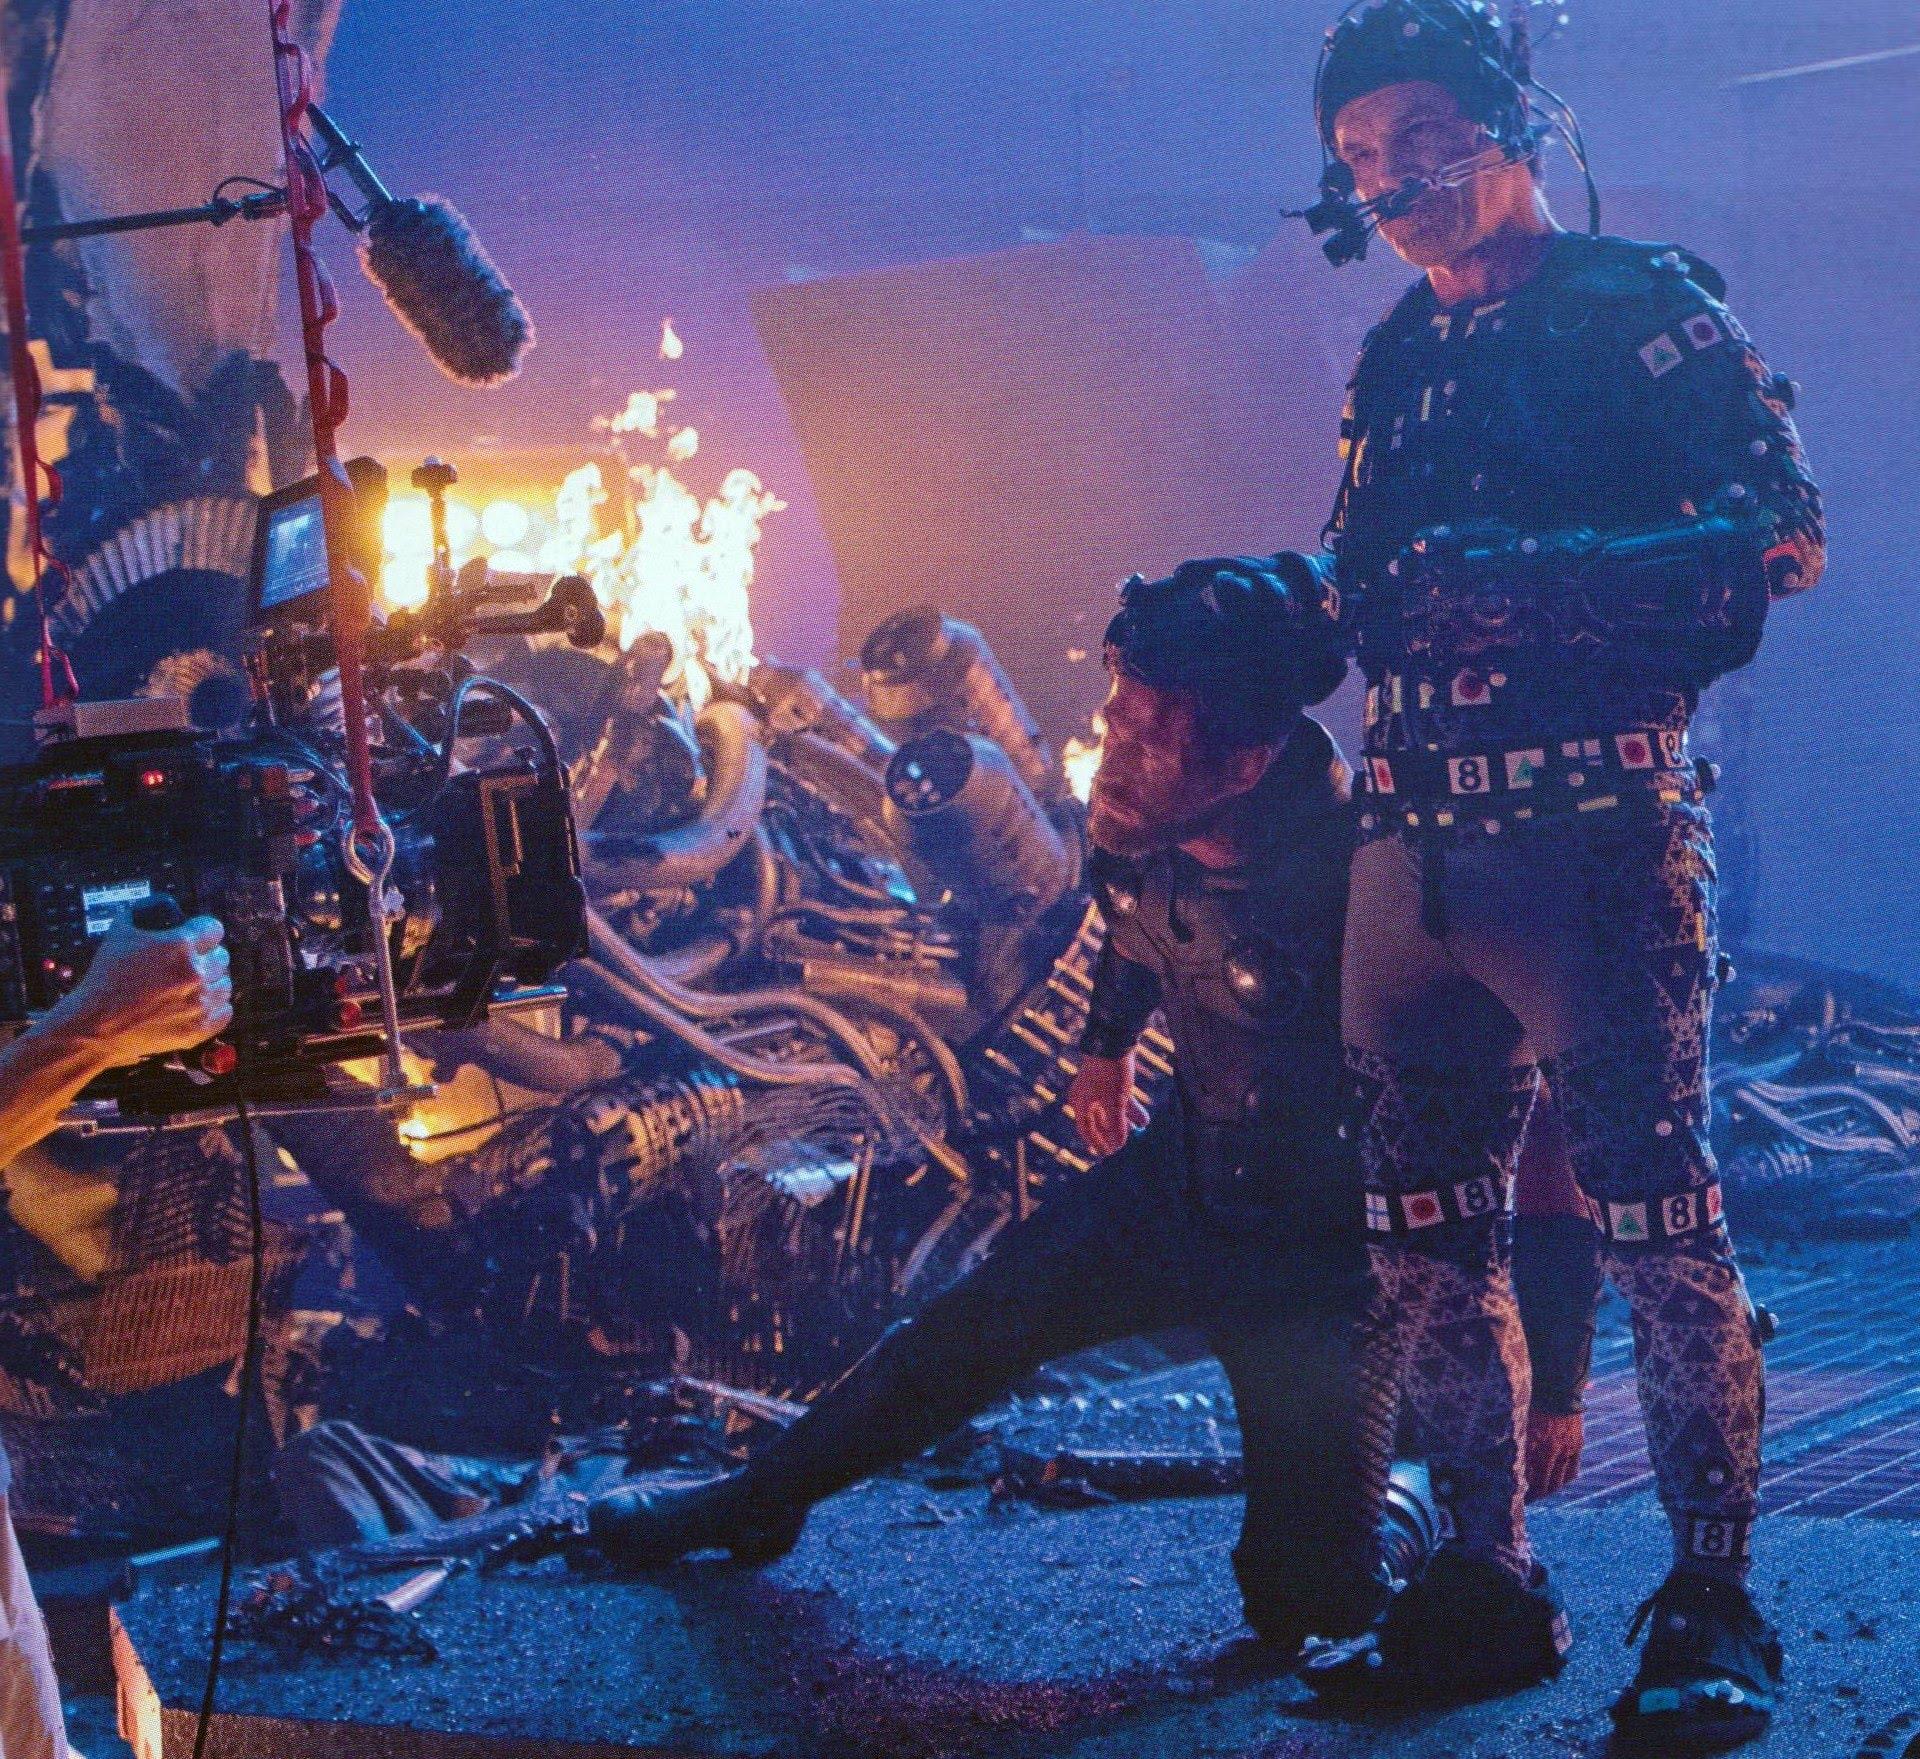 Oscars 2019 - Best Visual Effects : 第91回 アカデミー賞の最優秀視覚効果賞にノミネートされた傑作5作品をまとめたトリビュート・ビデオ ! !